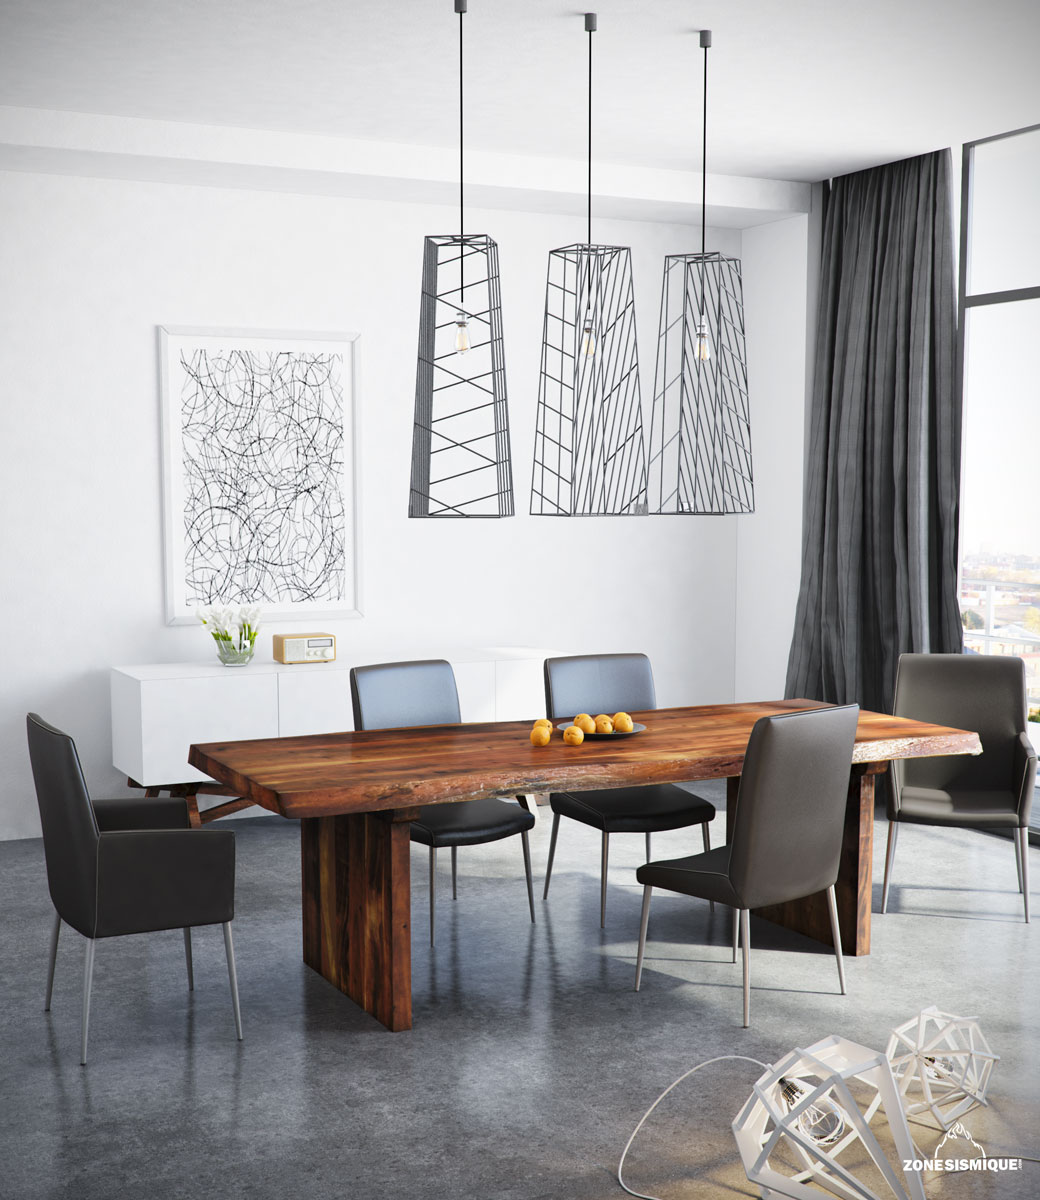 Zone sismique colibri lifestyle salle a manger micheal 3d for Salle a manger 3d